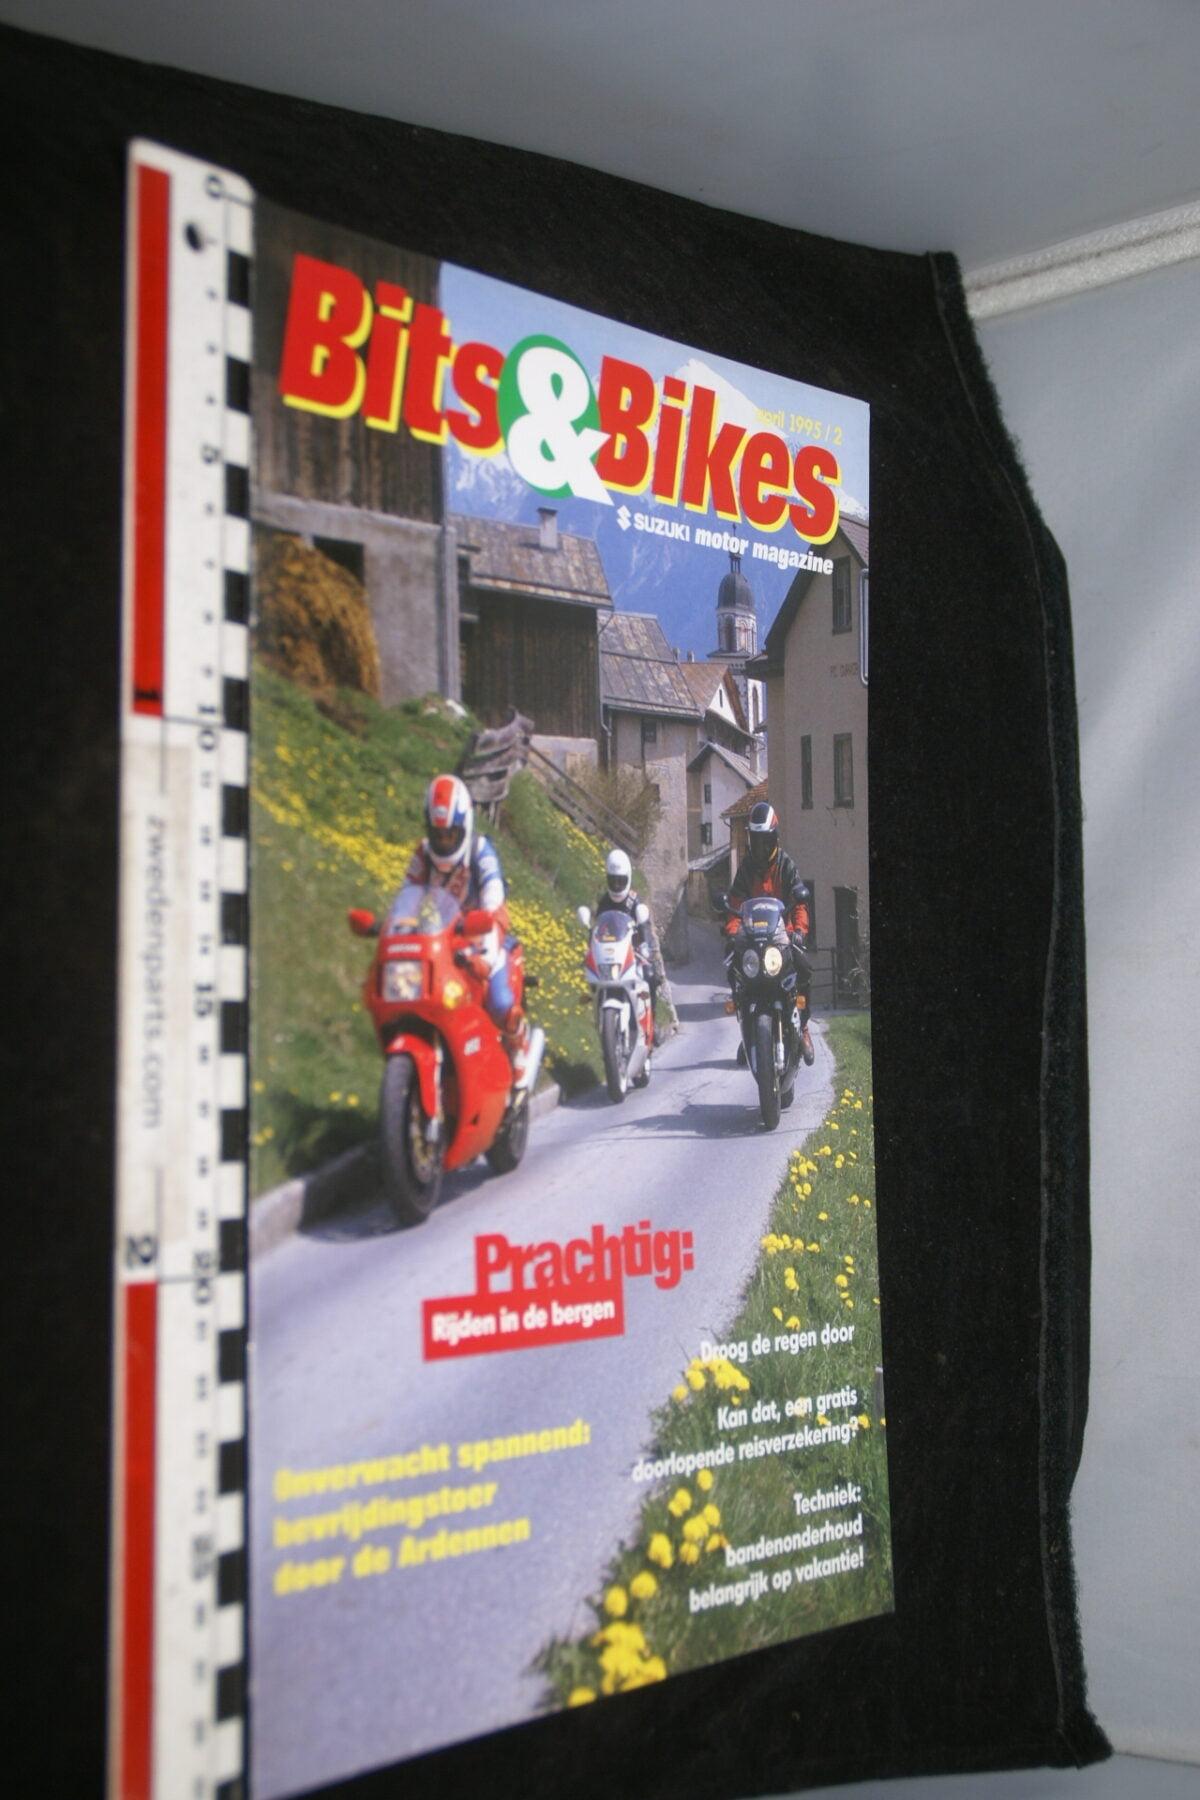 DSC02200 1995-2 originele tijdschrift Suzuki motorfietsen-1195796a